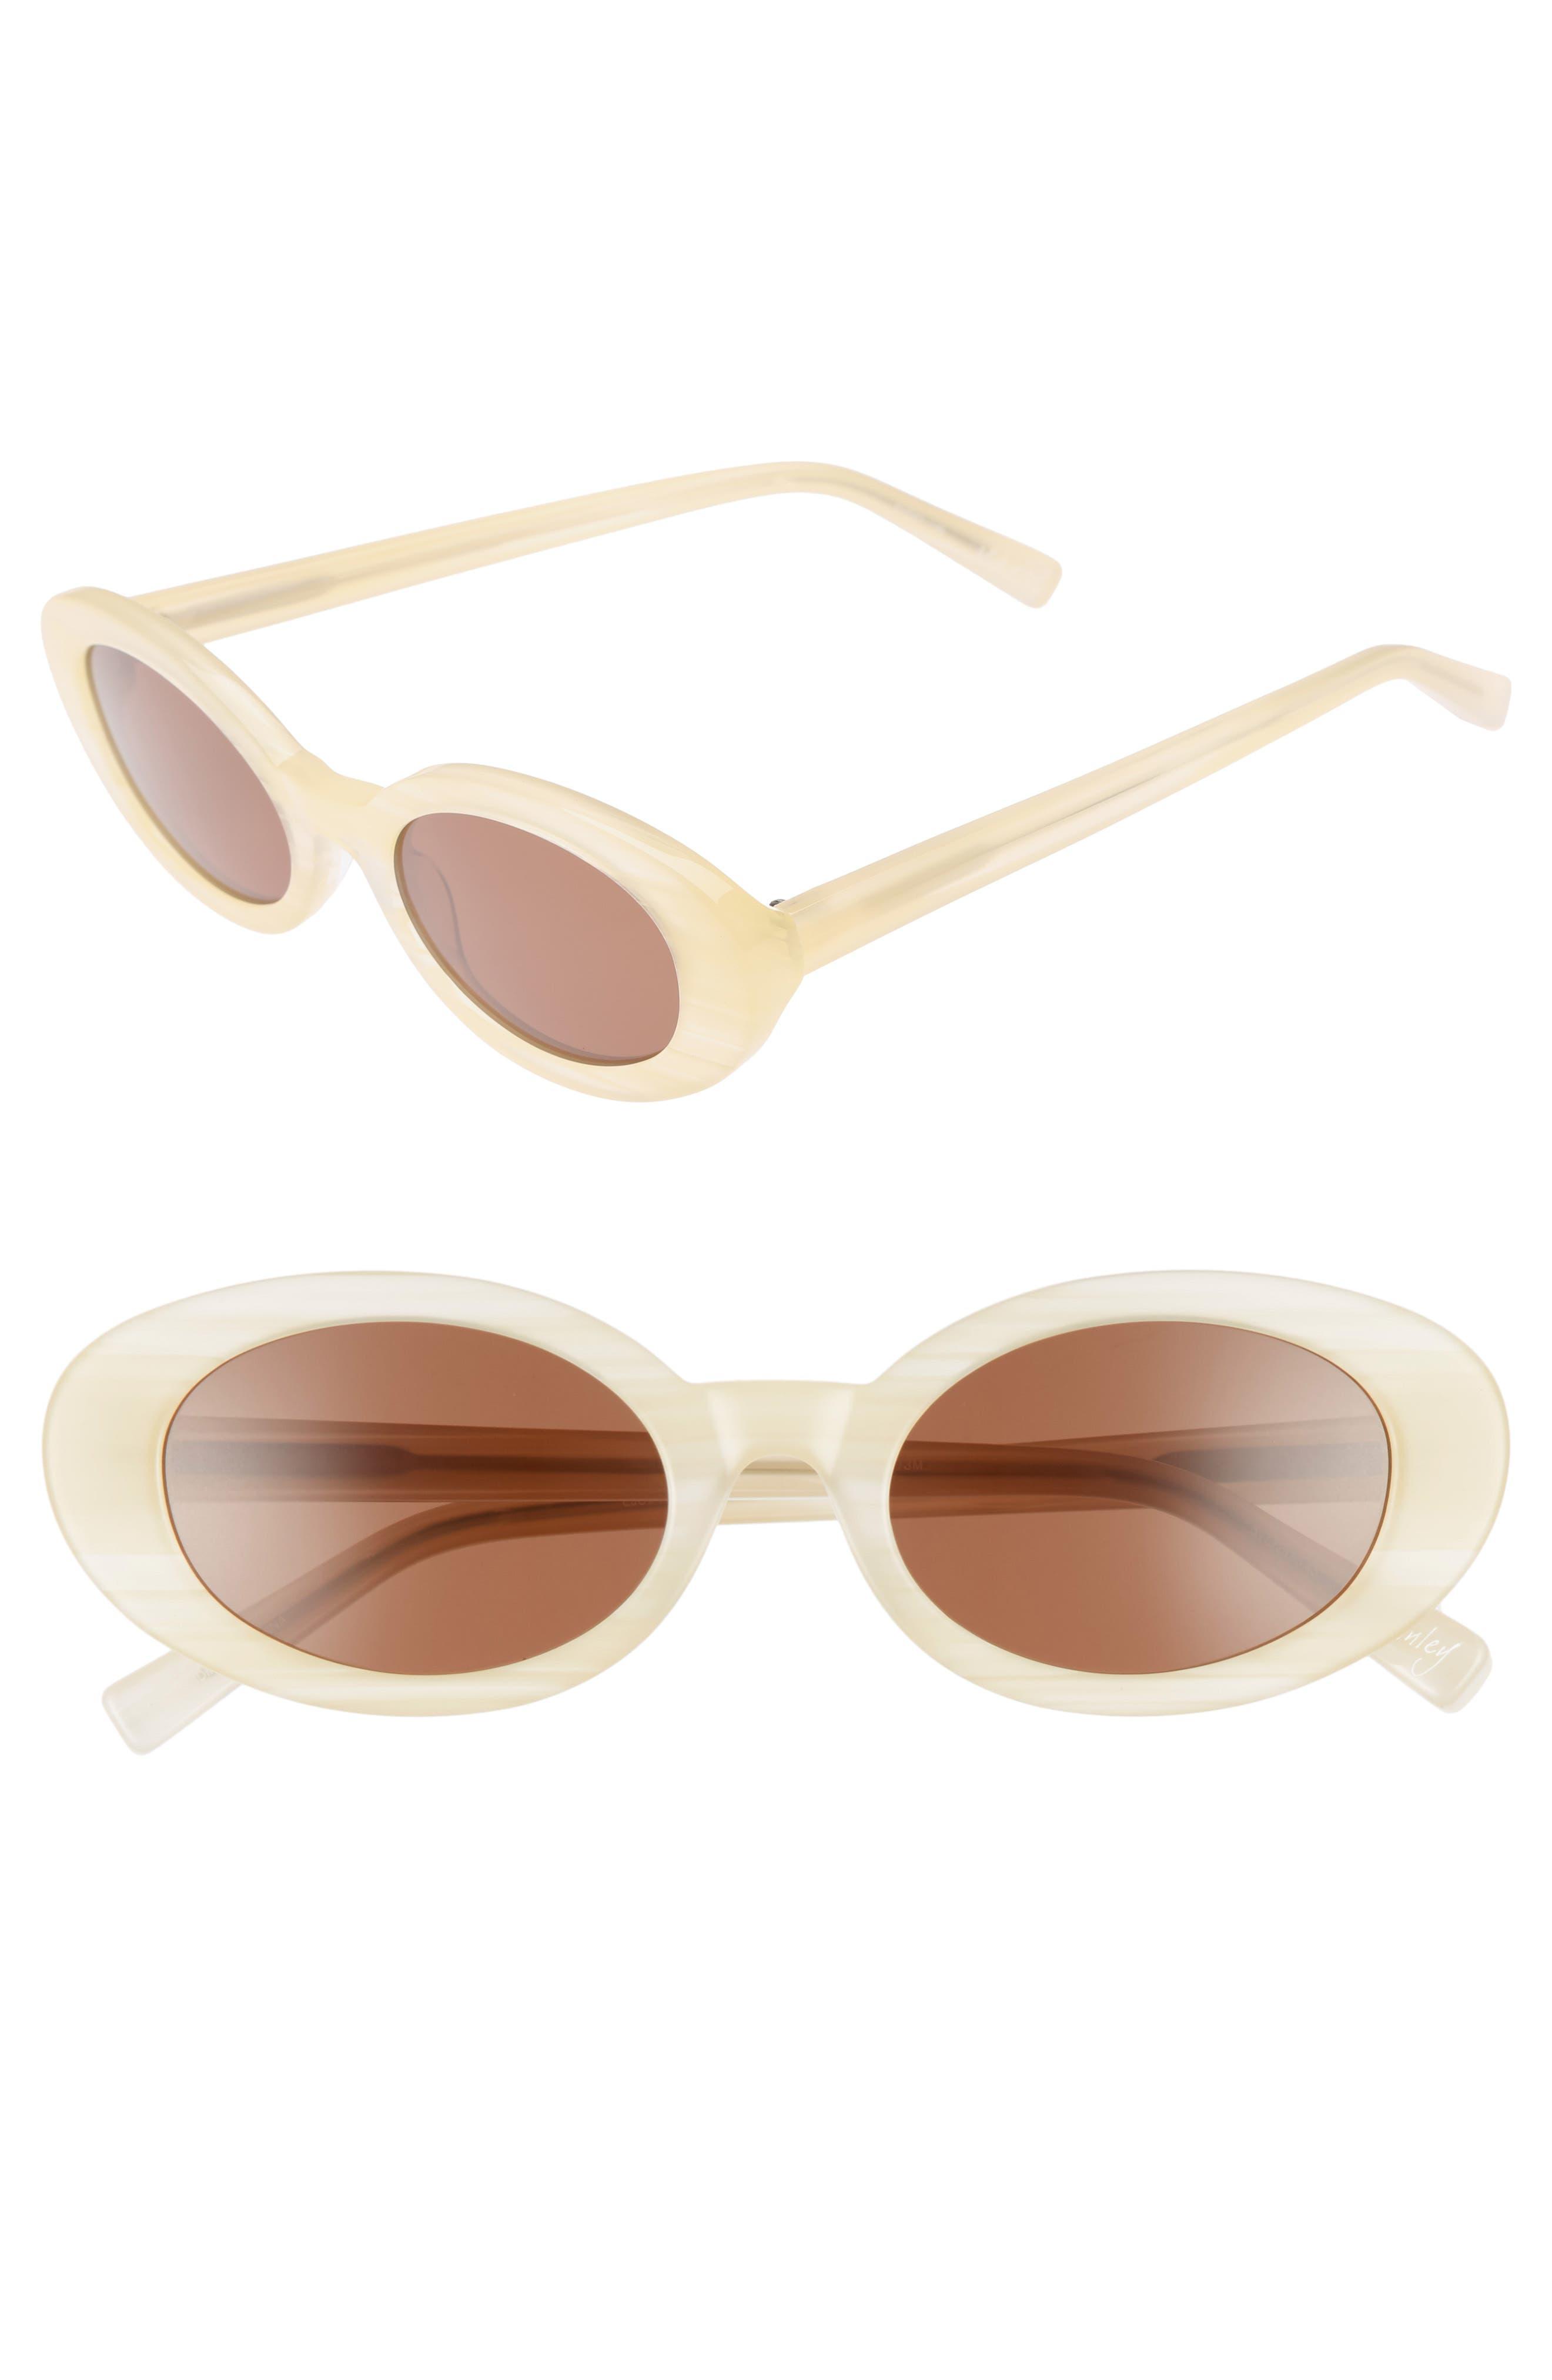 Alternate Image 1 Selected - Elizabeth and James McKinely 51mm Oval Sunglasses